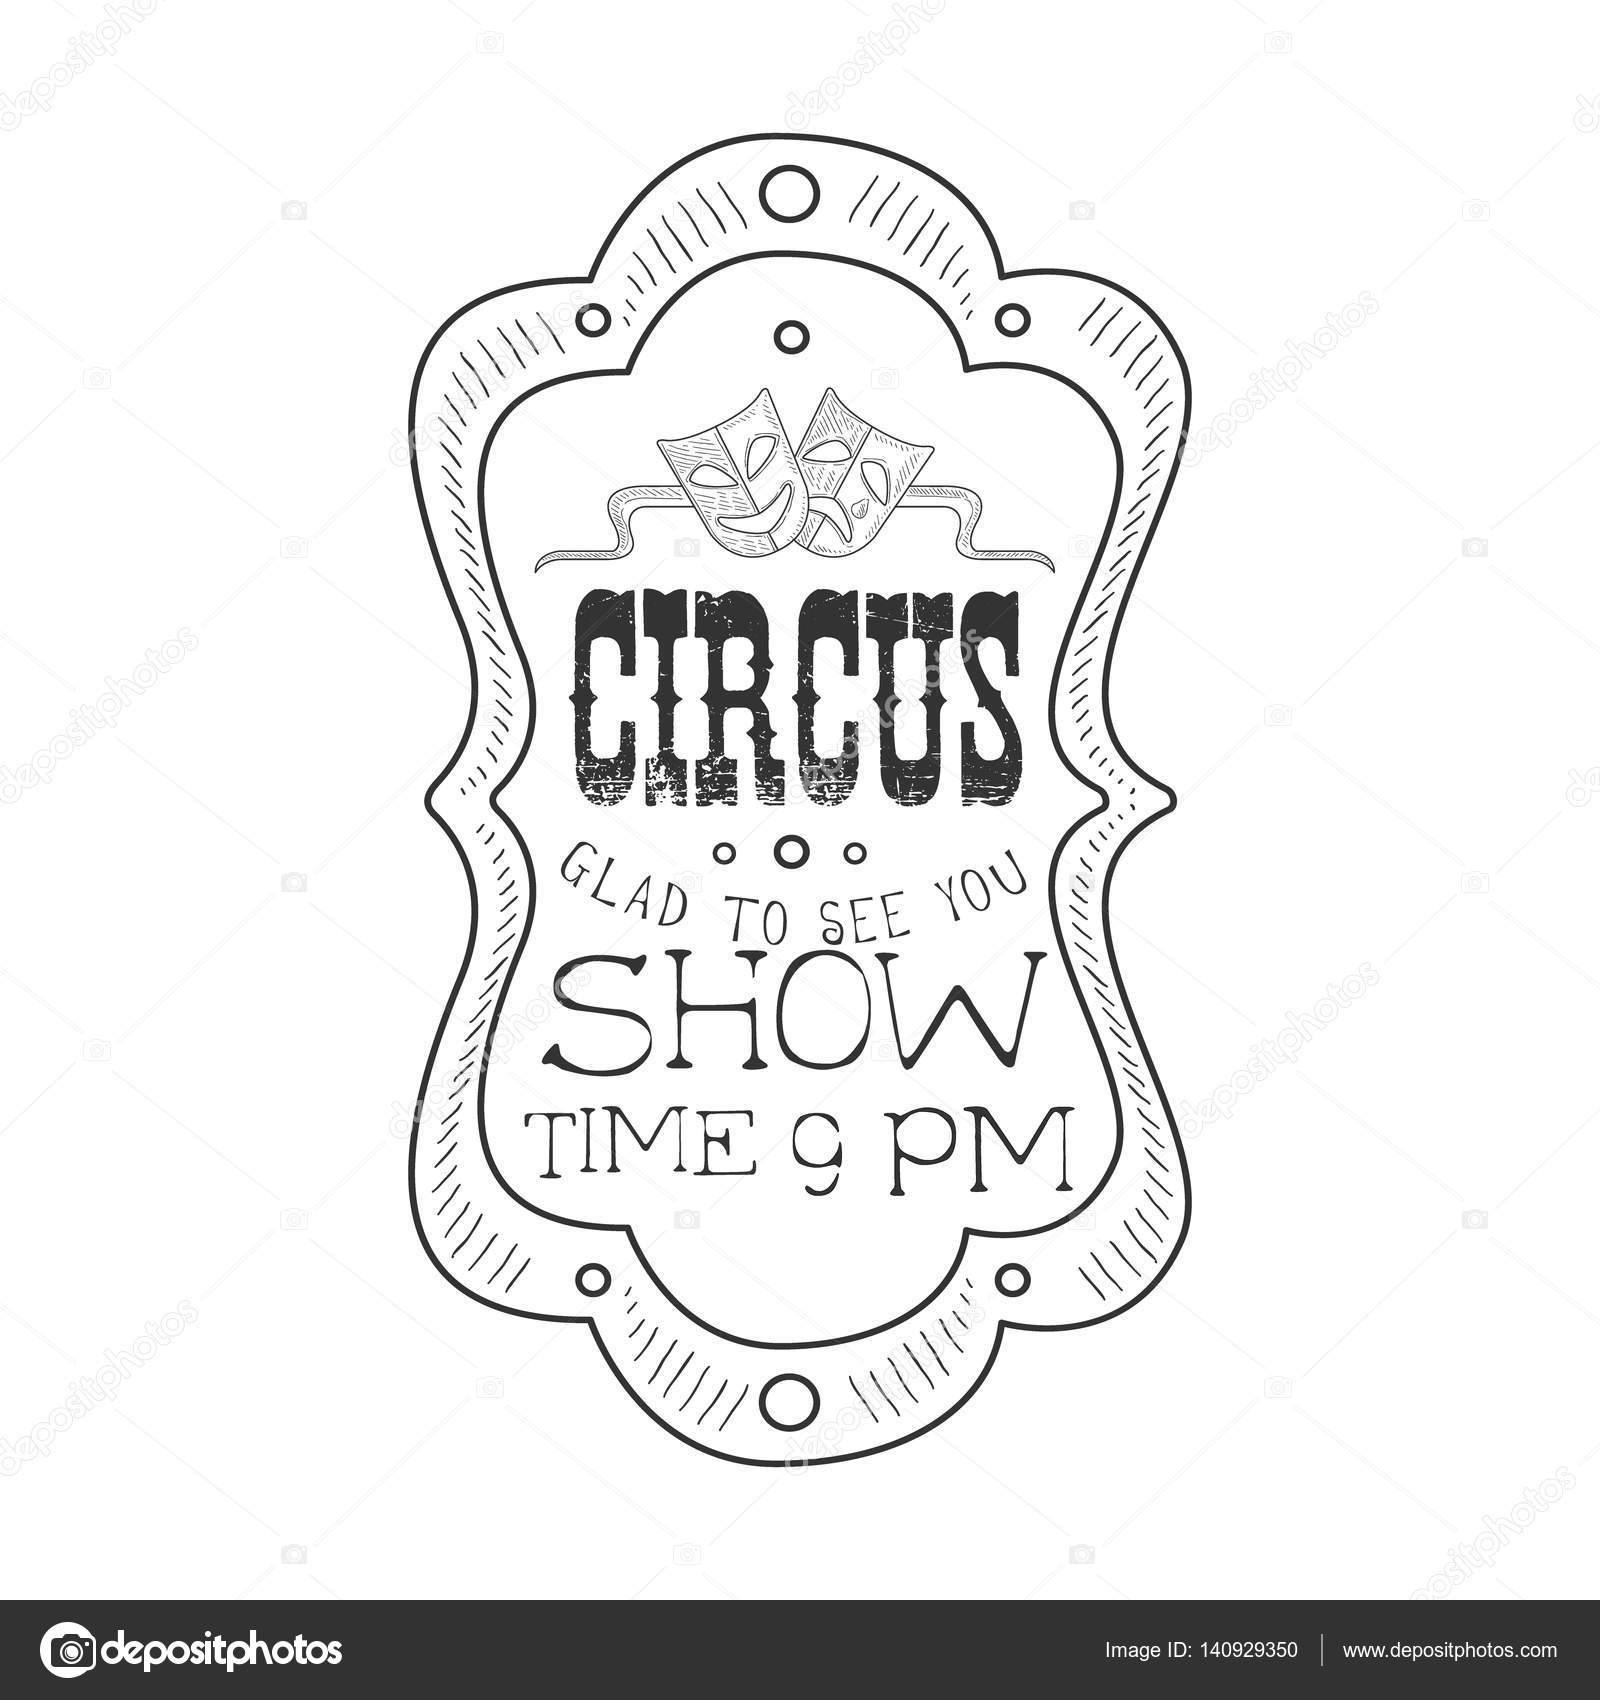 Drawn sign circus  In Pencil Drawn Show